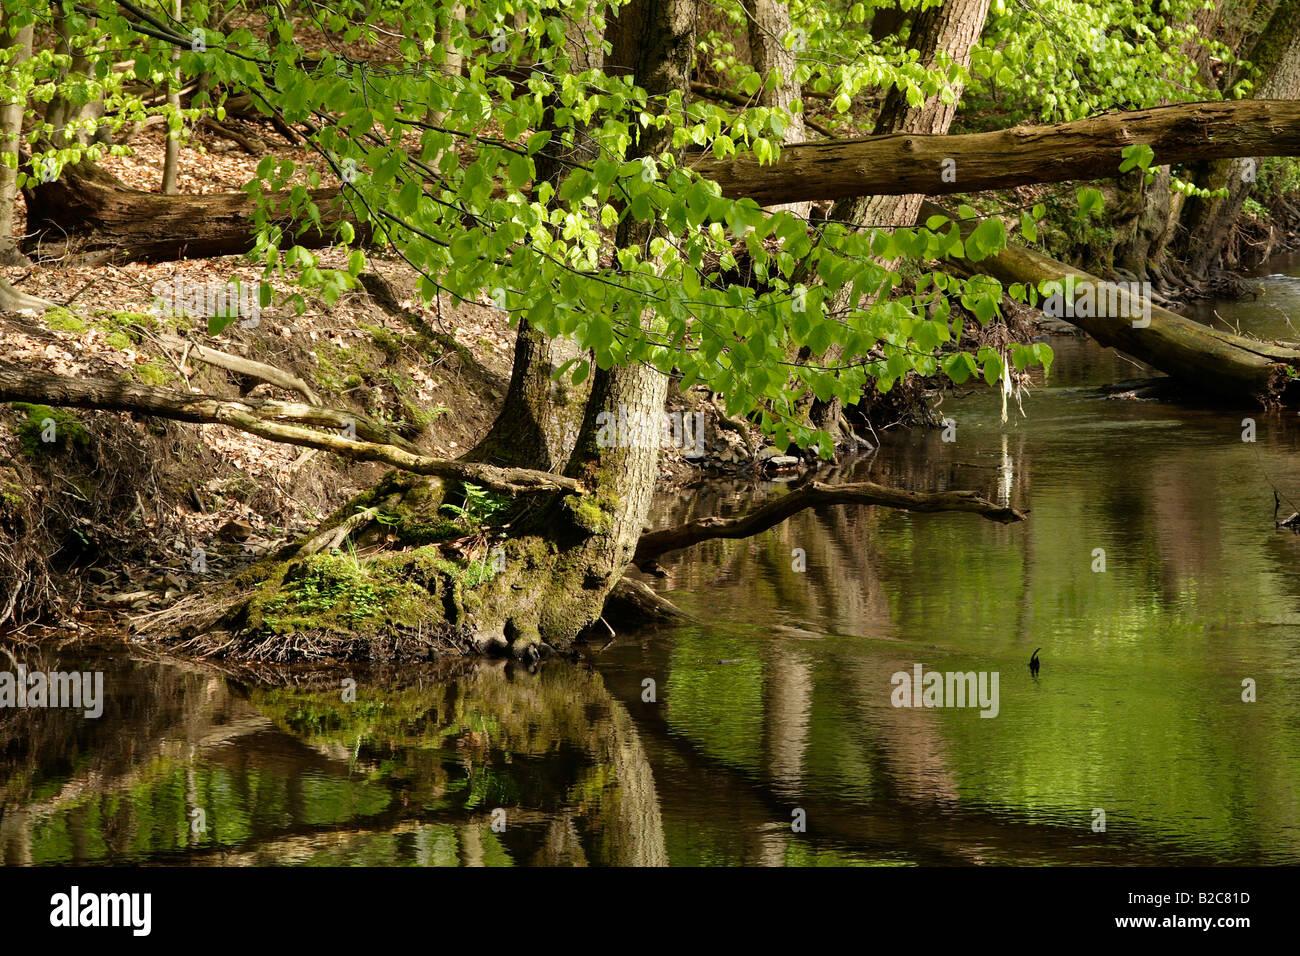 Stream, Lueerwald Forest, Sauerland, North Rhine-Westphalia, Germany, Europe - Stock Image